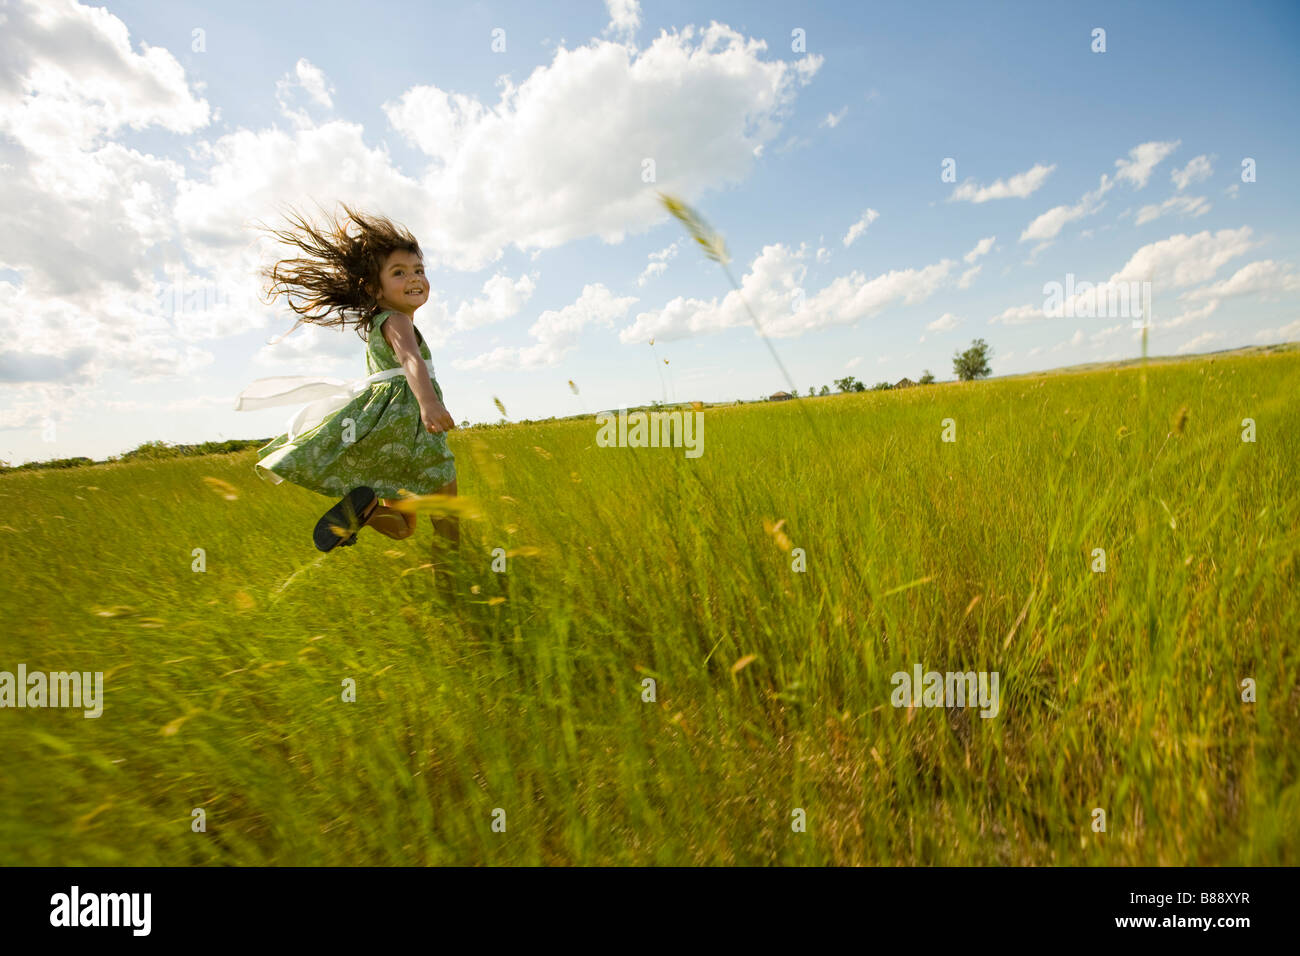 Girl running through a grassy field in north dakota stock photo girl running through a grassy field in north dakota voltagebd Images